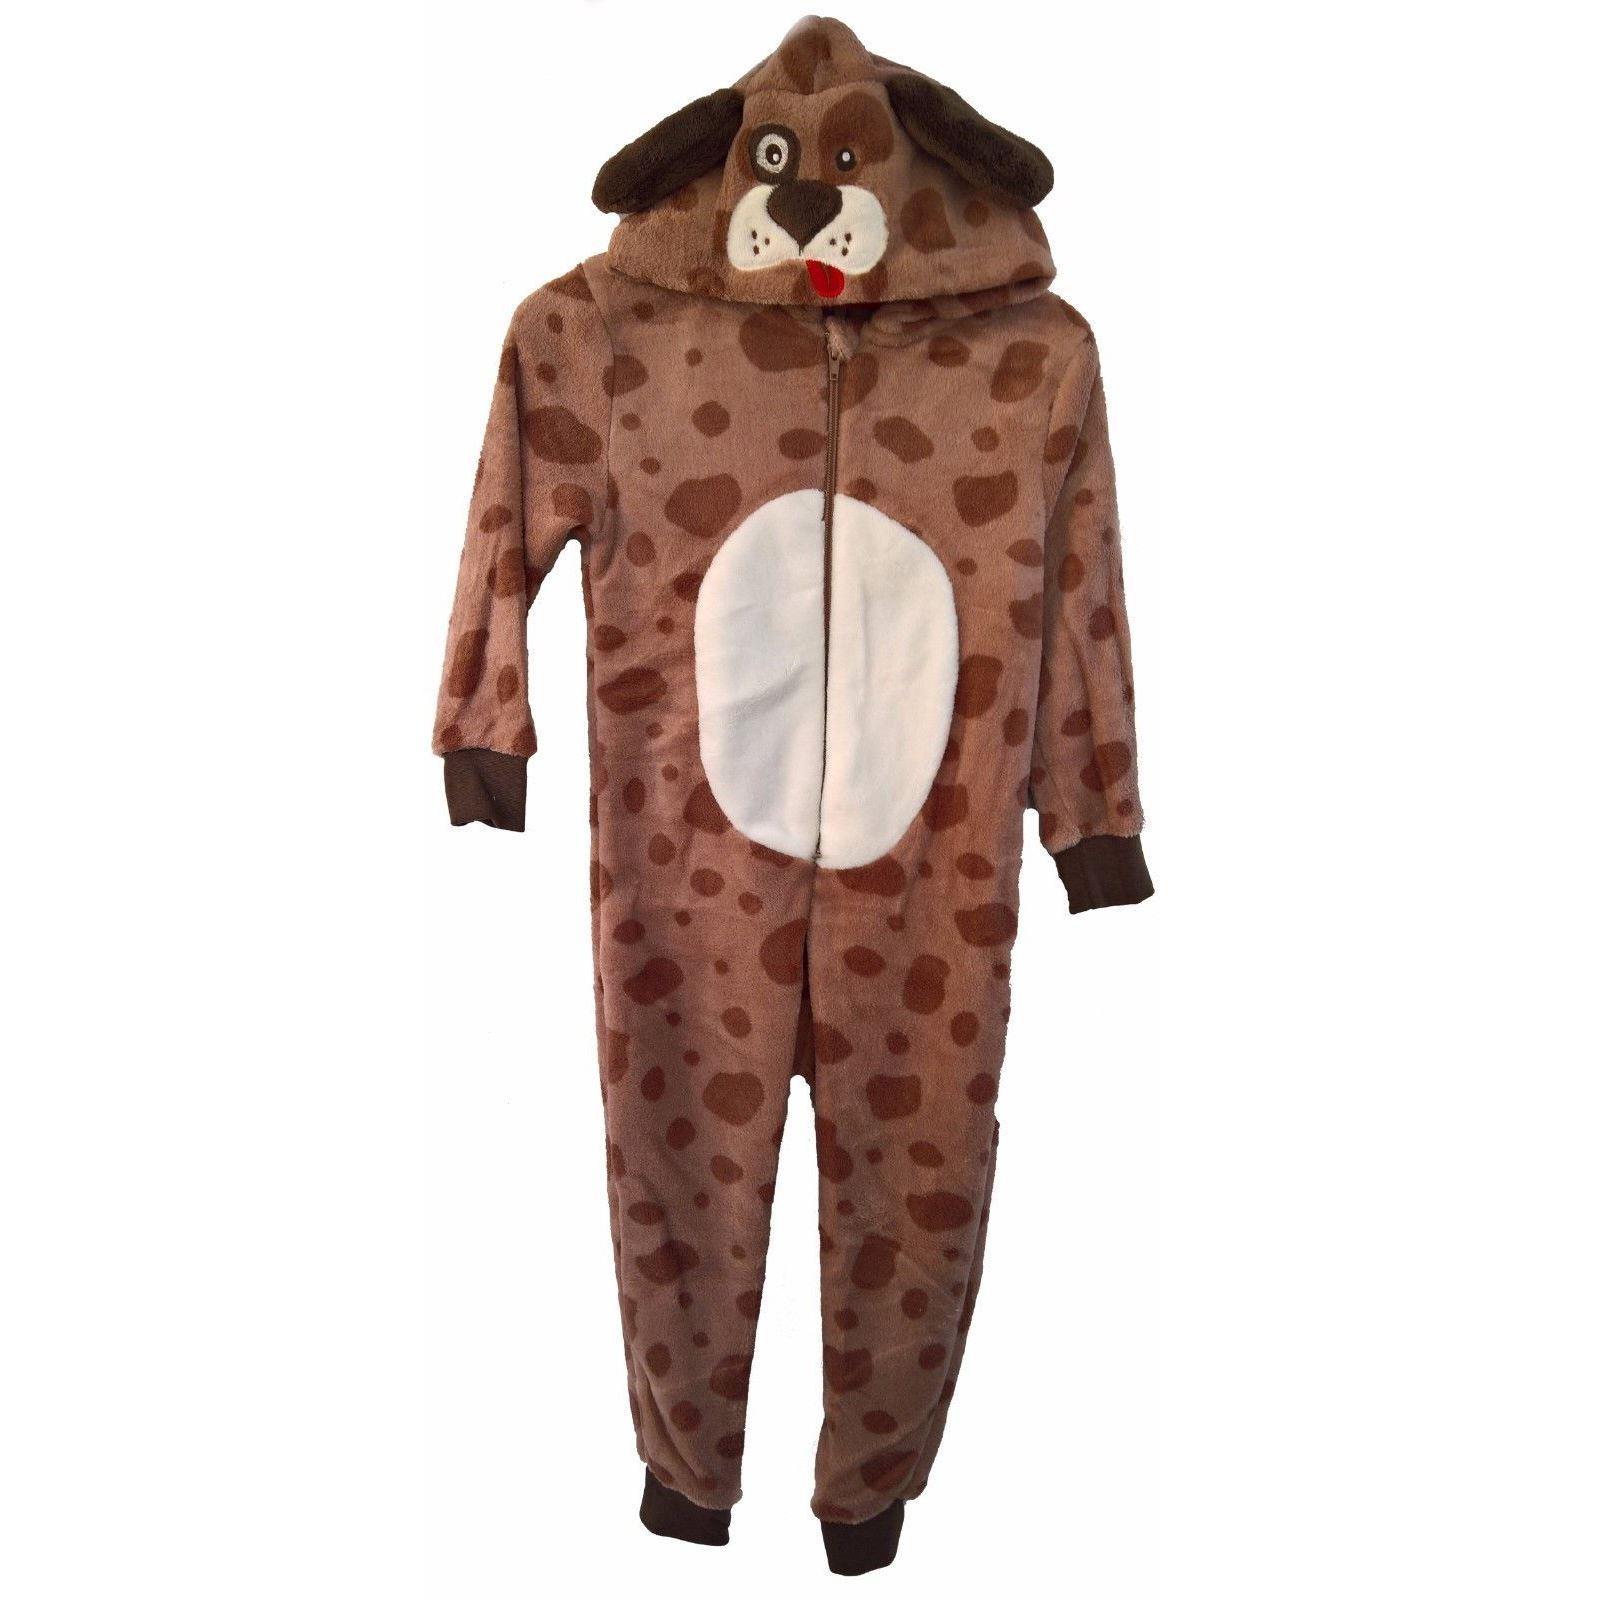 Animal Crazy Puppy Costume Onesie